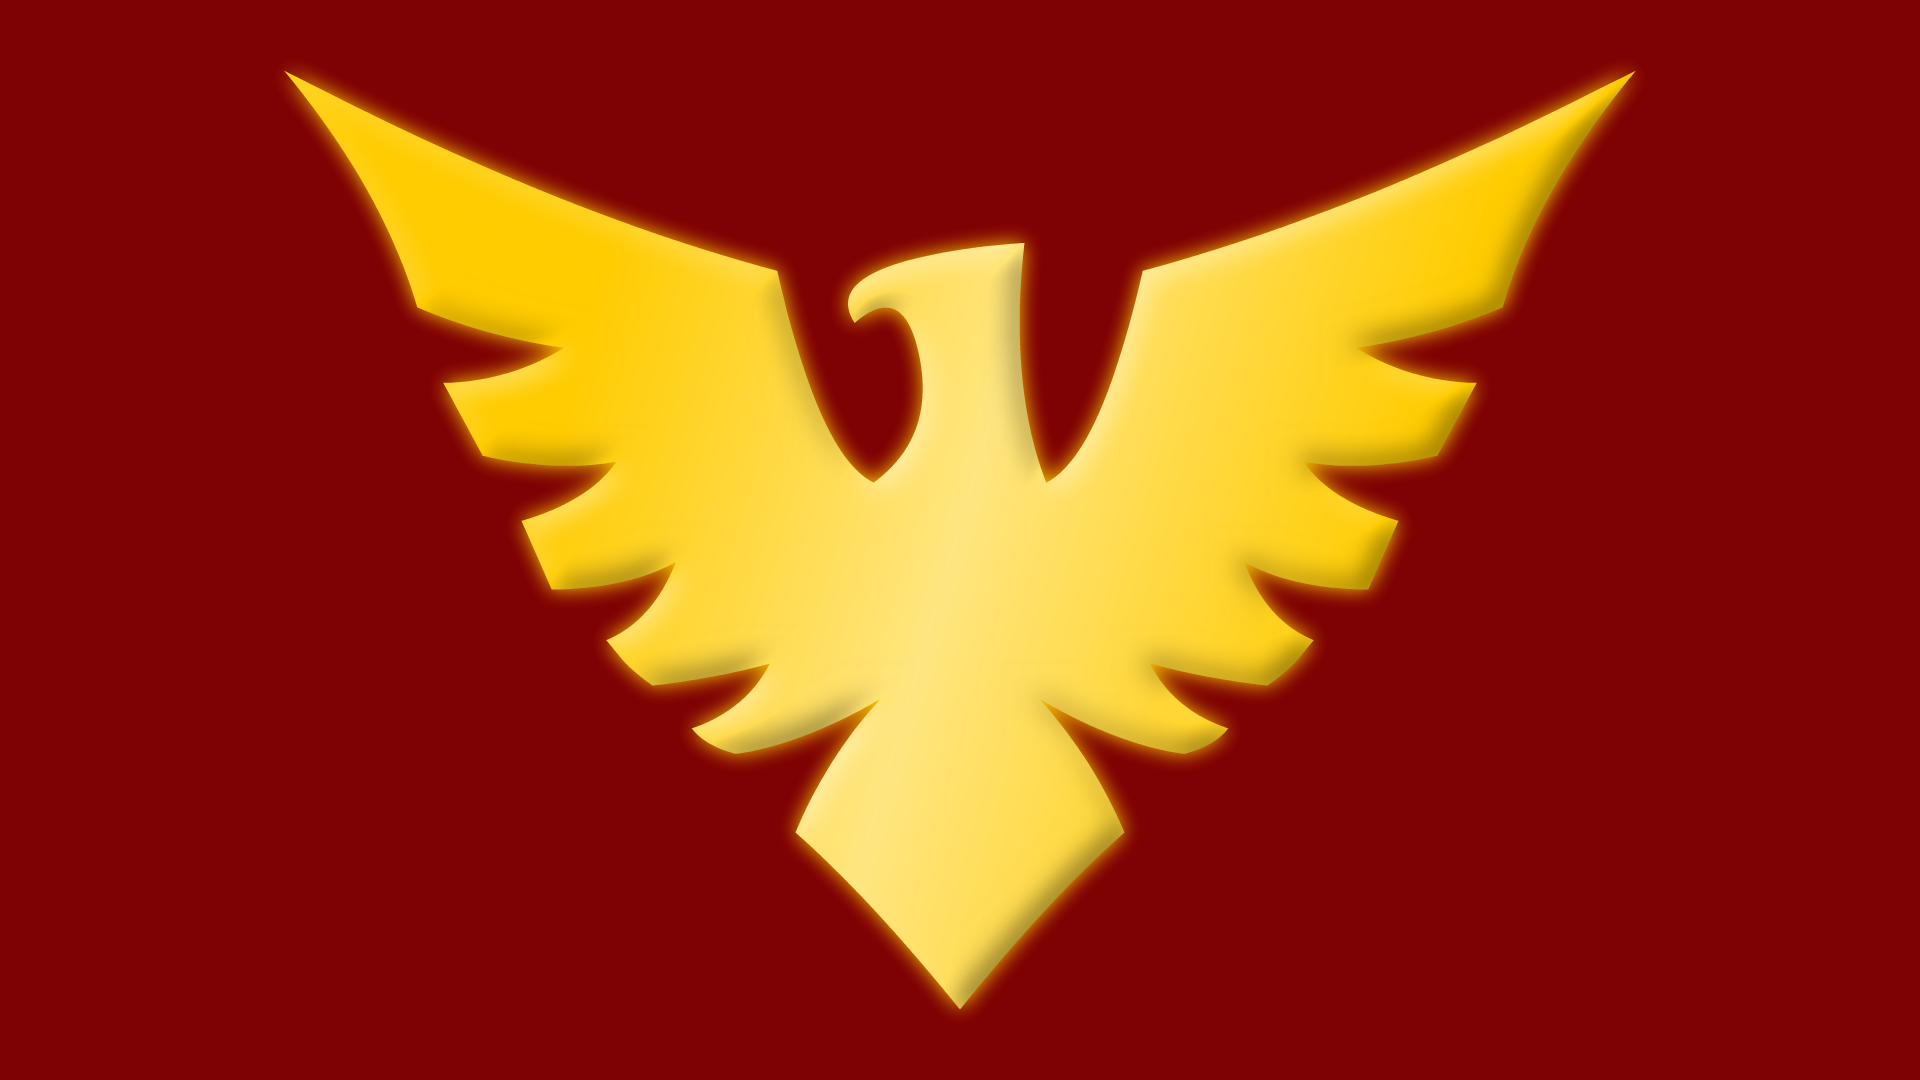 Dark Phoenix Logo Dark Phoenix Symbol by Yurtigo